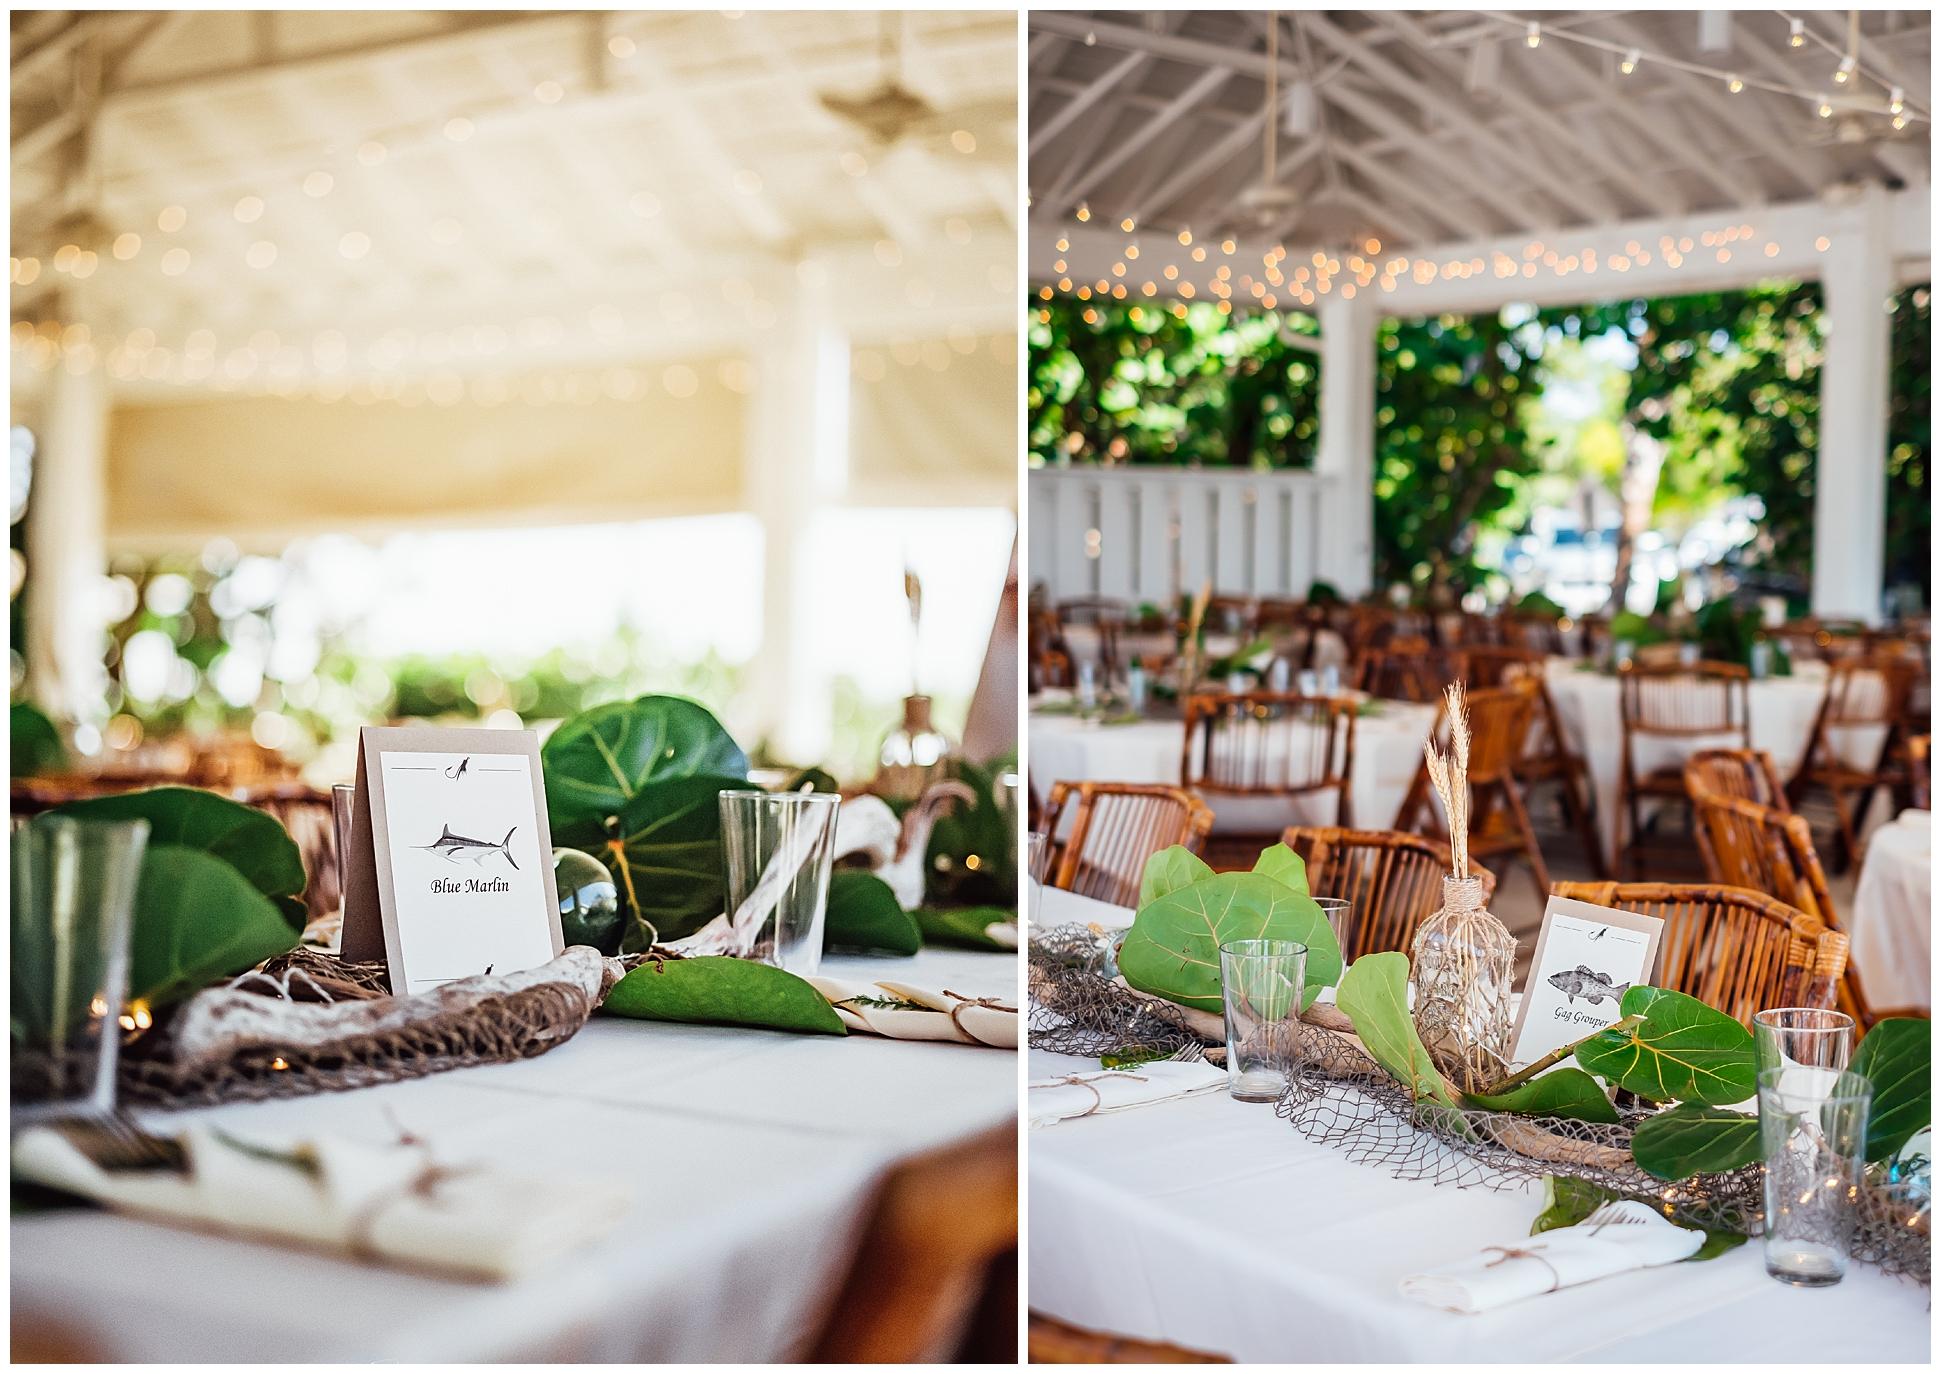 medium-format-film-vs-digital-wedding-photography-florida-beach_0014.jpg